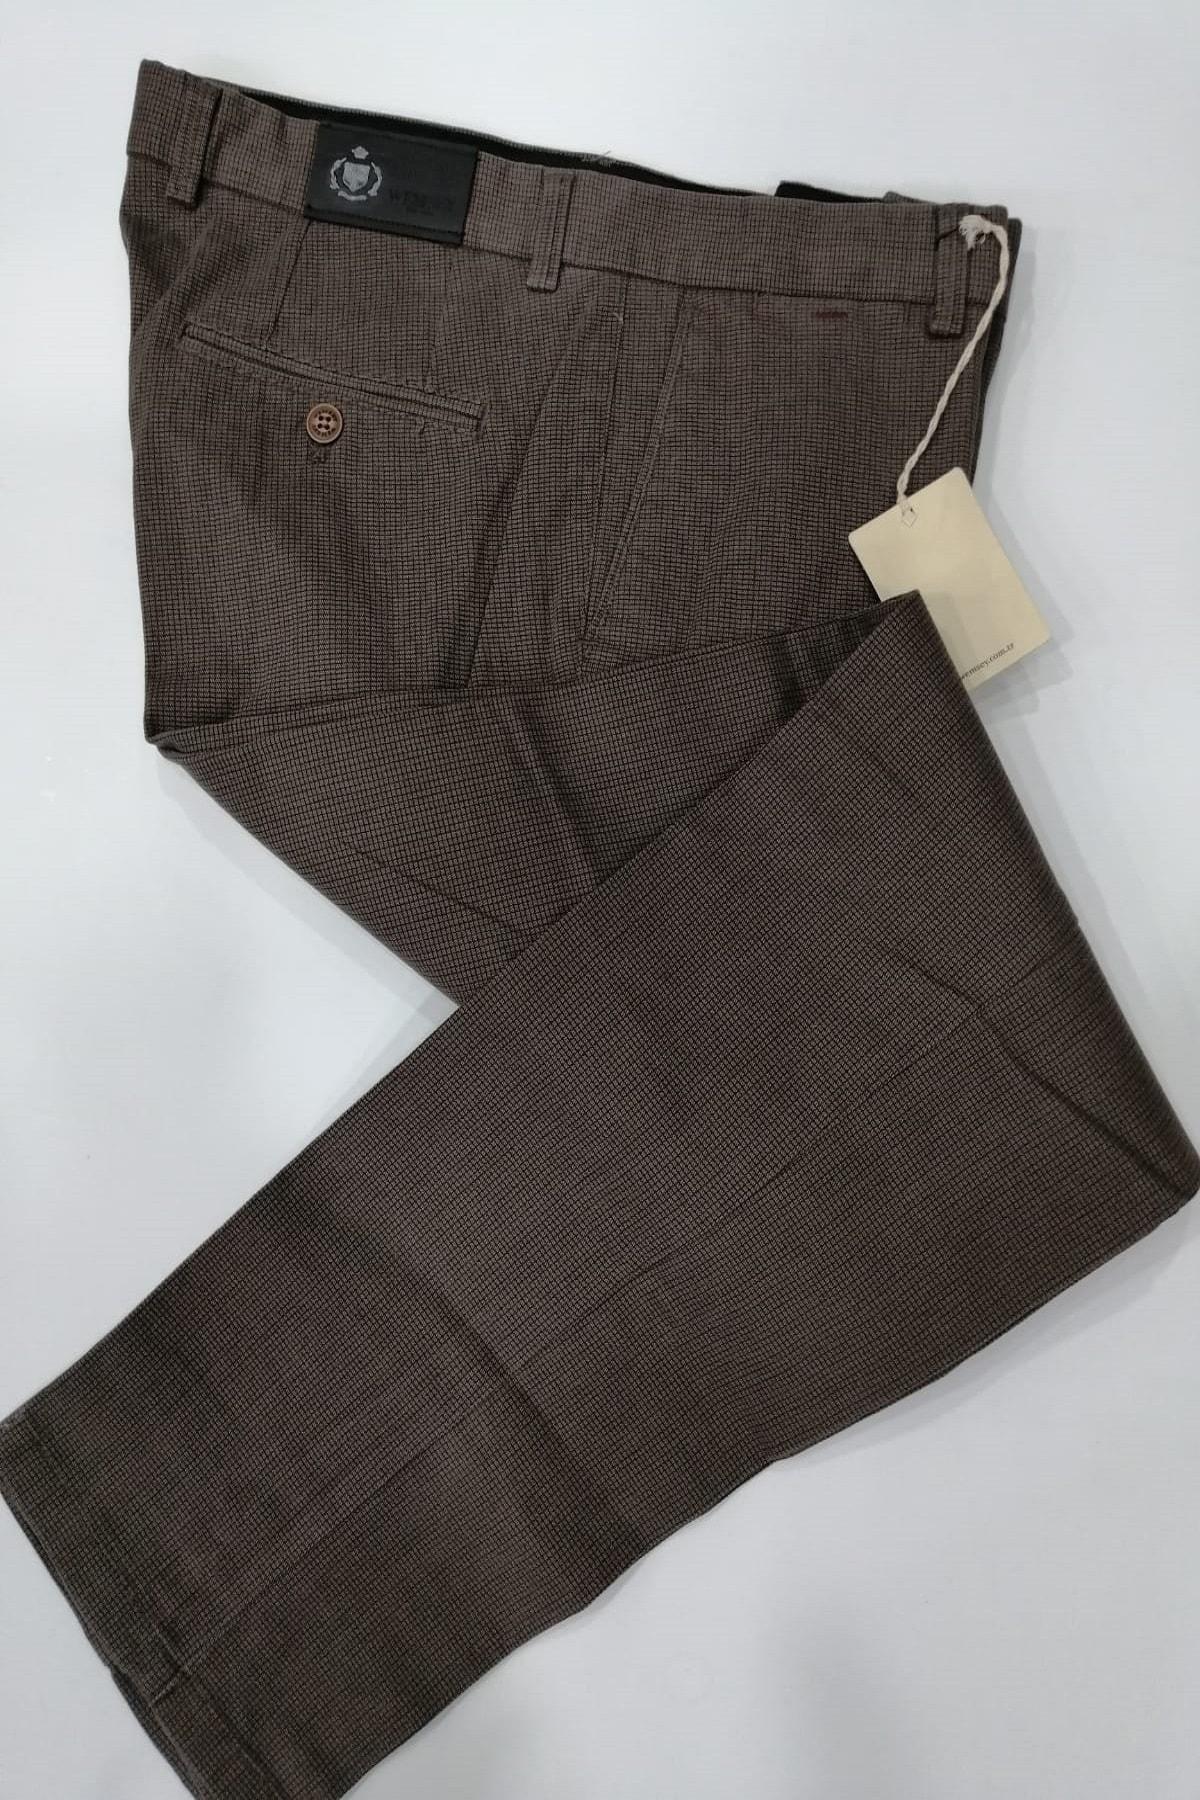 WEMSEY Regular Piti Kareli Kanvas Pantolon 2